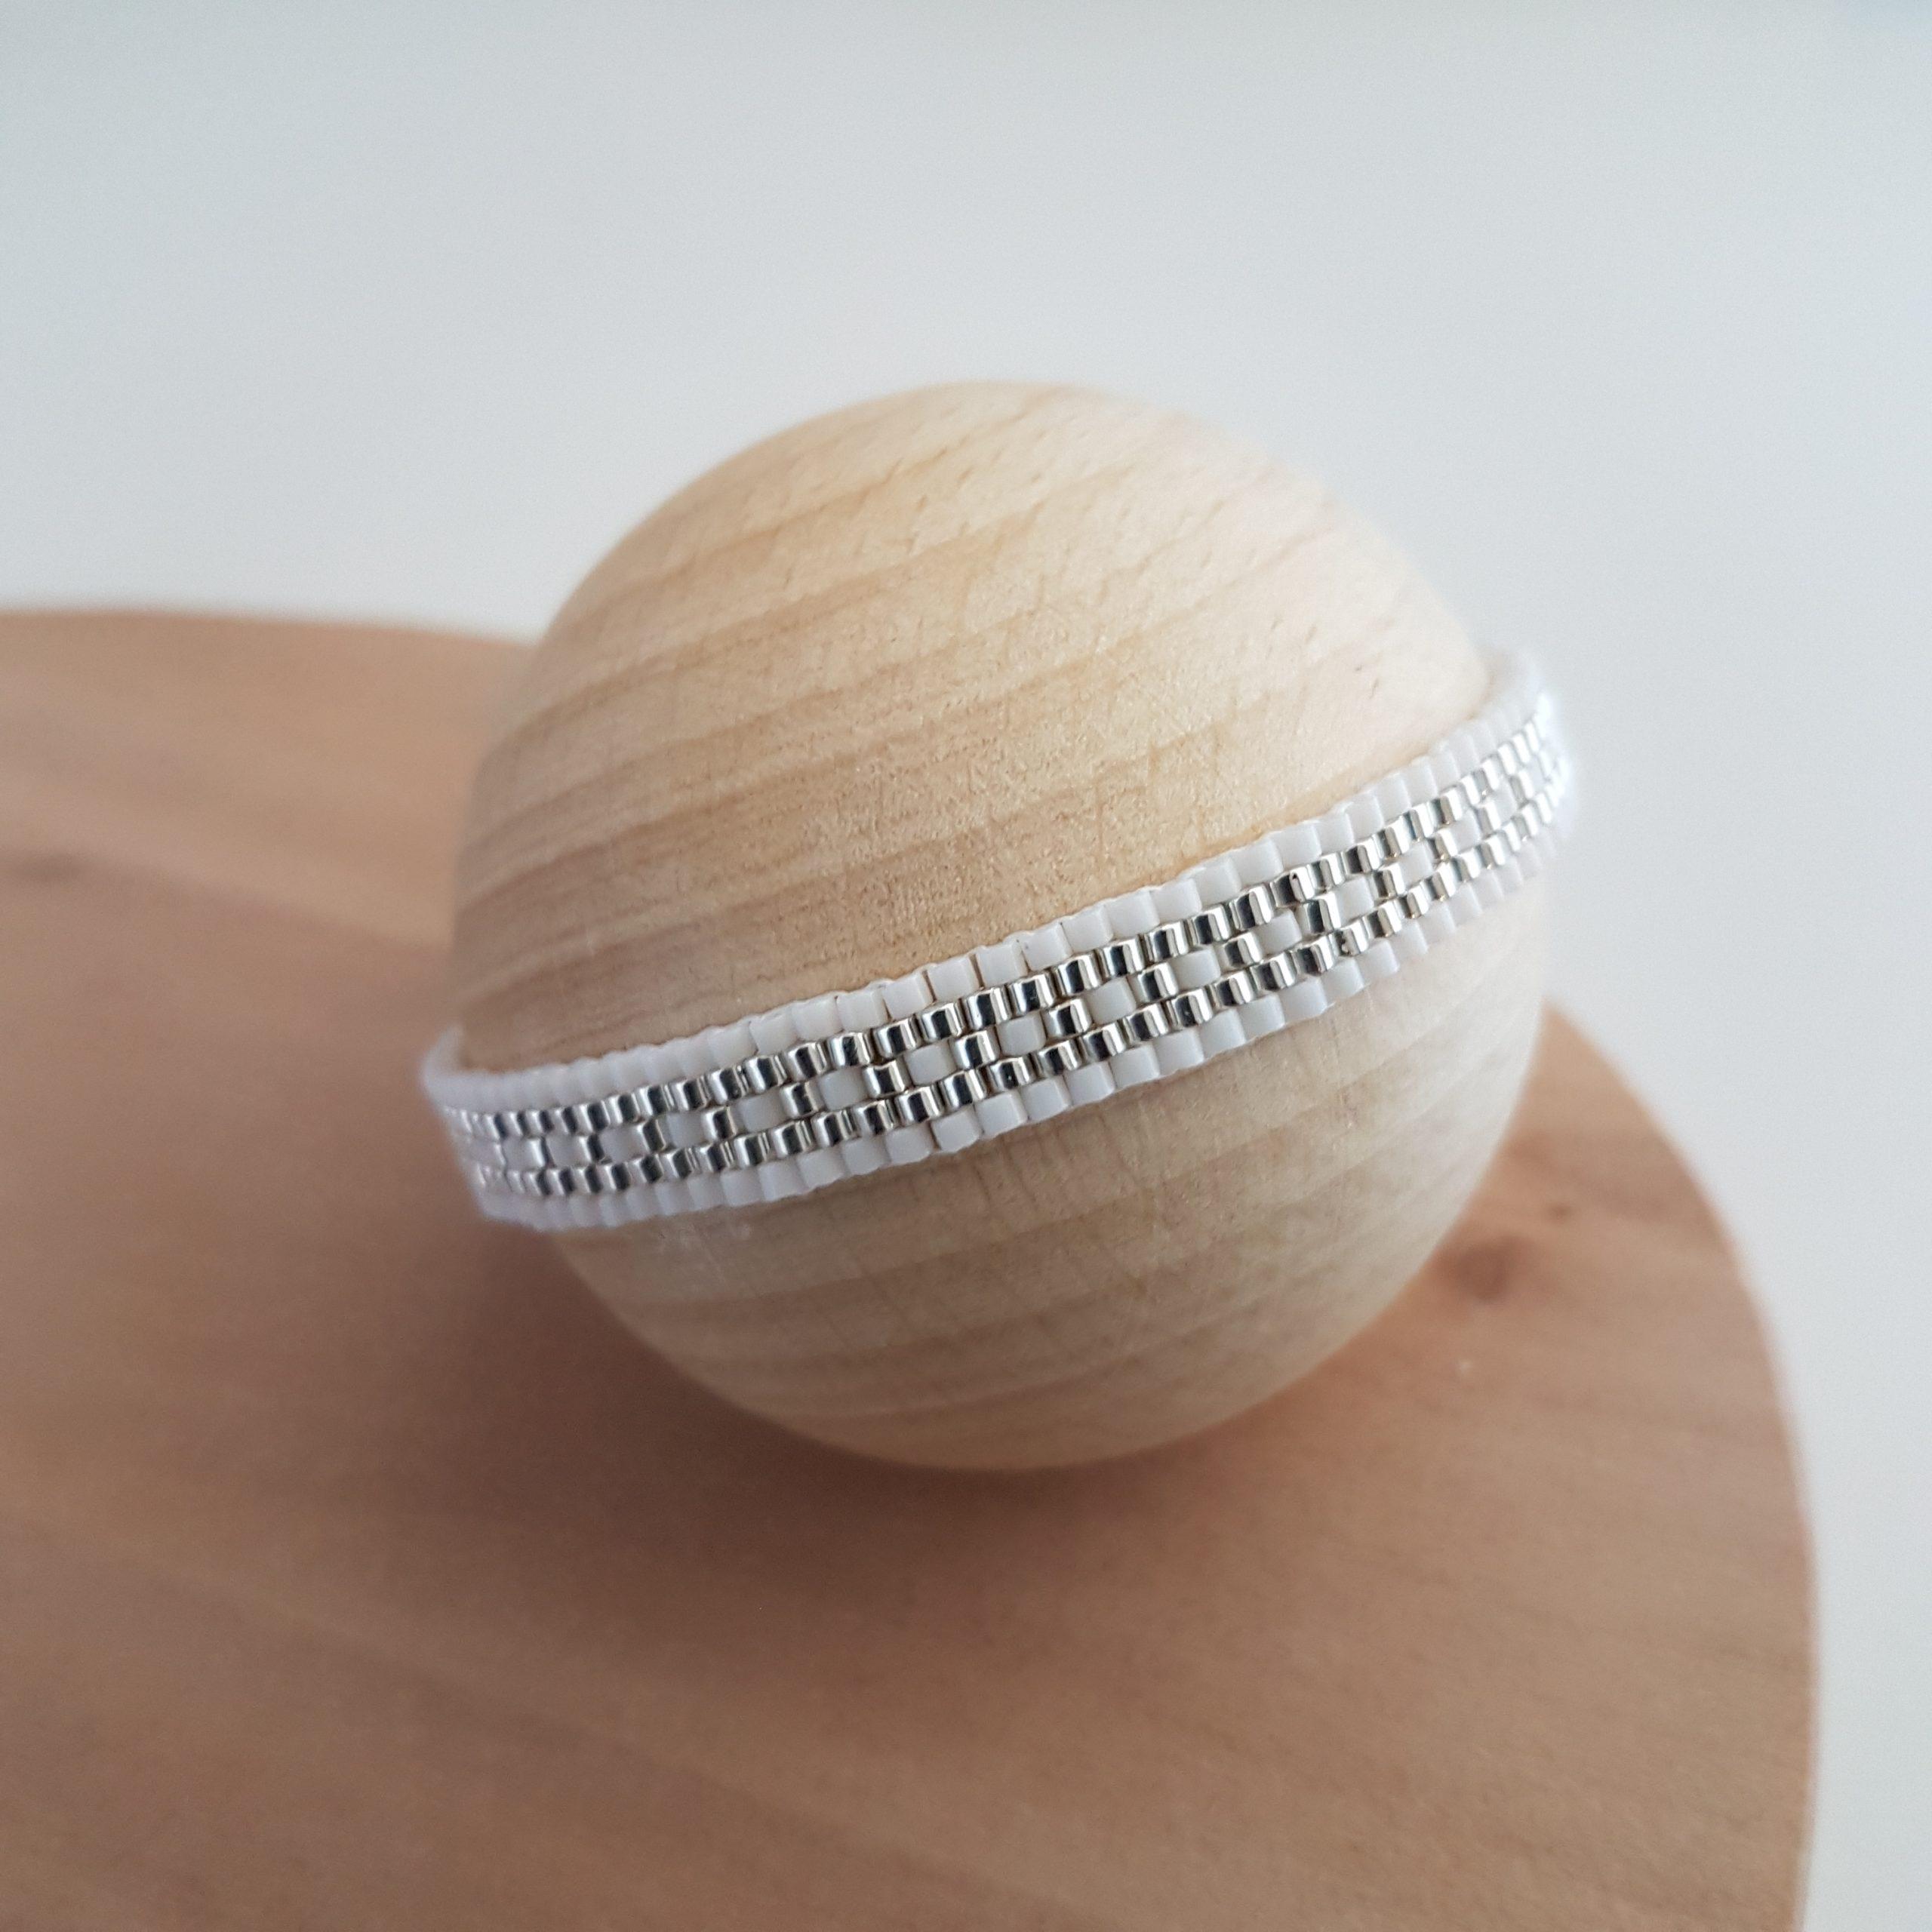 Cadeau femme Bijou artisanal lyon Bracelet Les cumulables blanc argent 925 miyuki